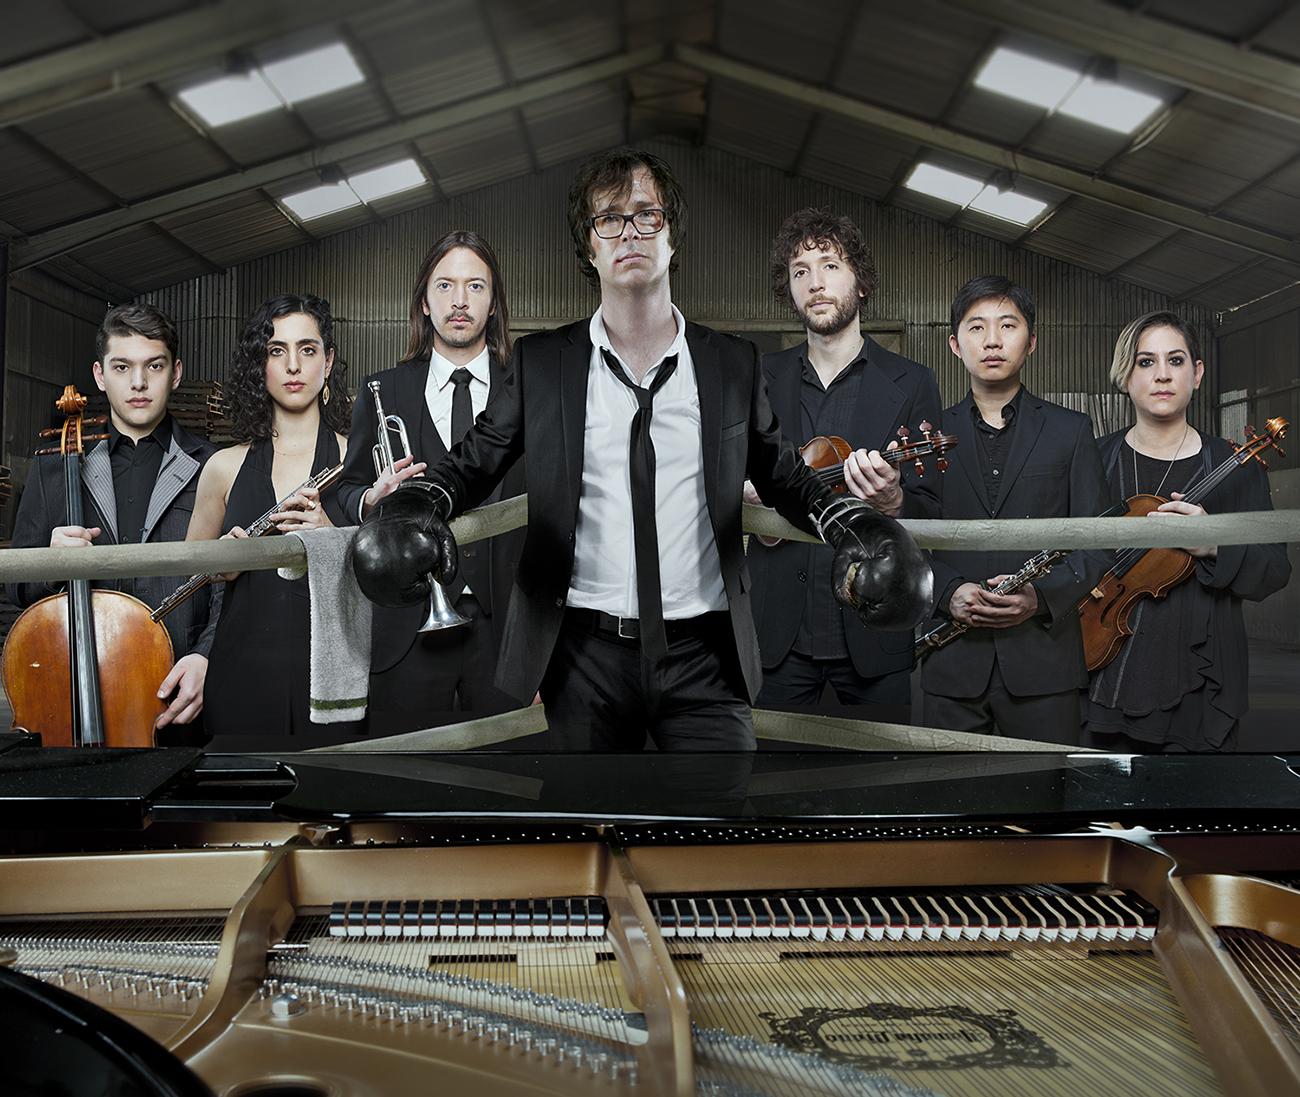 Singer-pianist Ben Folds will perform July 14 on the Levitt Pavilion stage at SteelStacks in Bethlehem.  (Courtesy Photo)